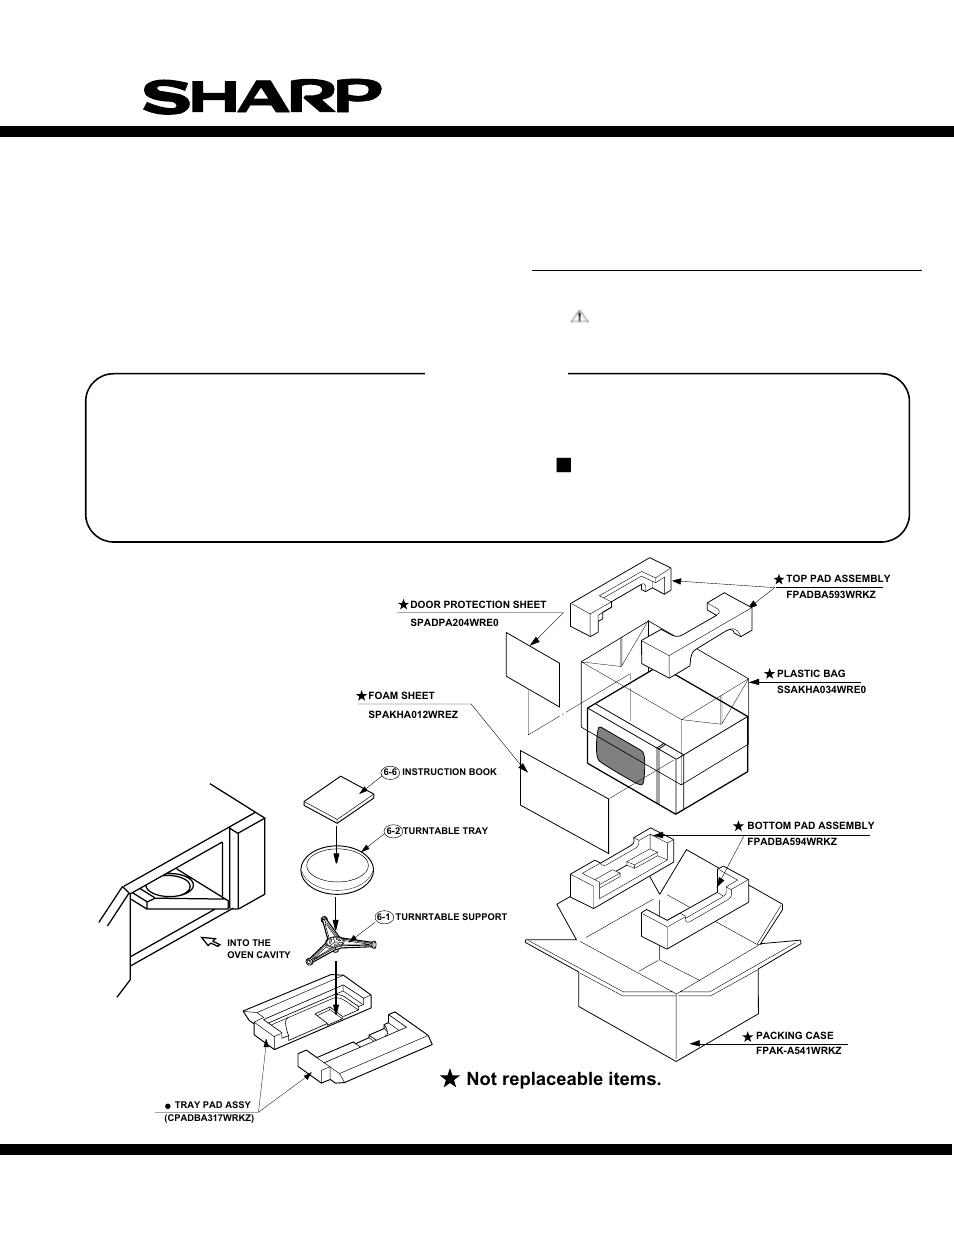 parts list r 305ks microwave oven